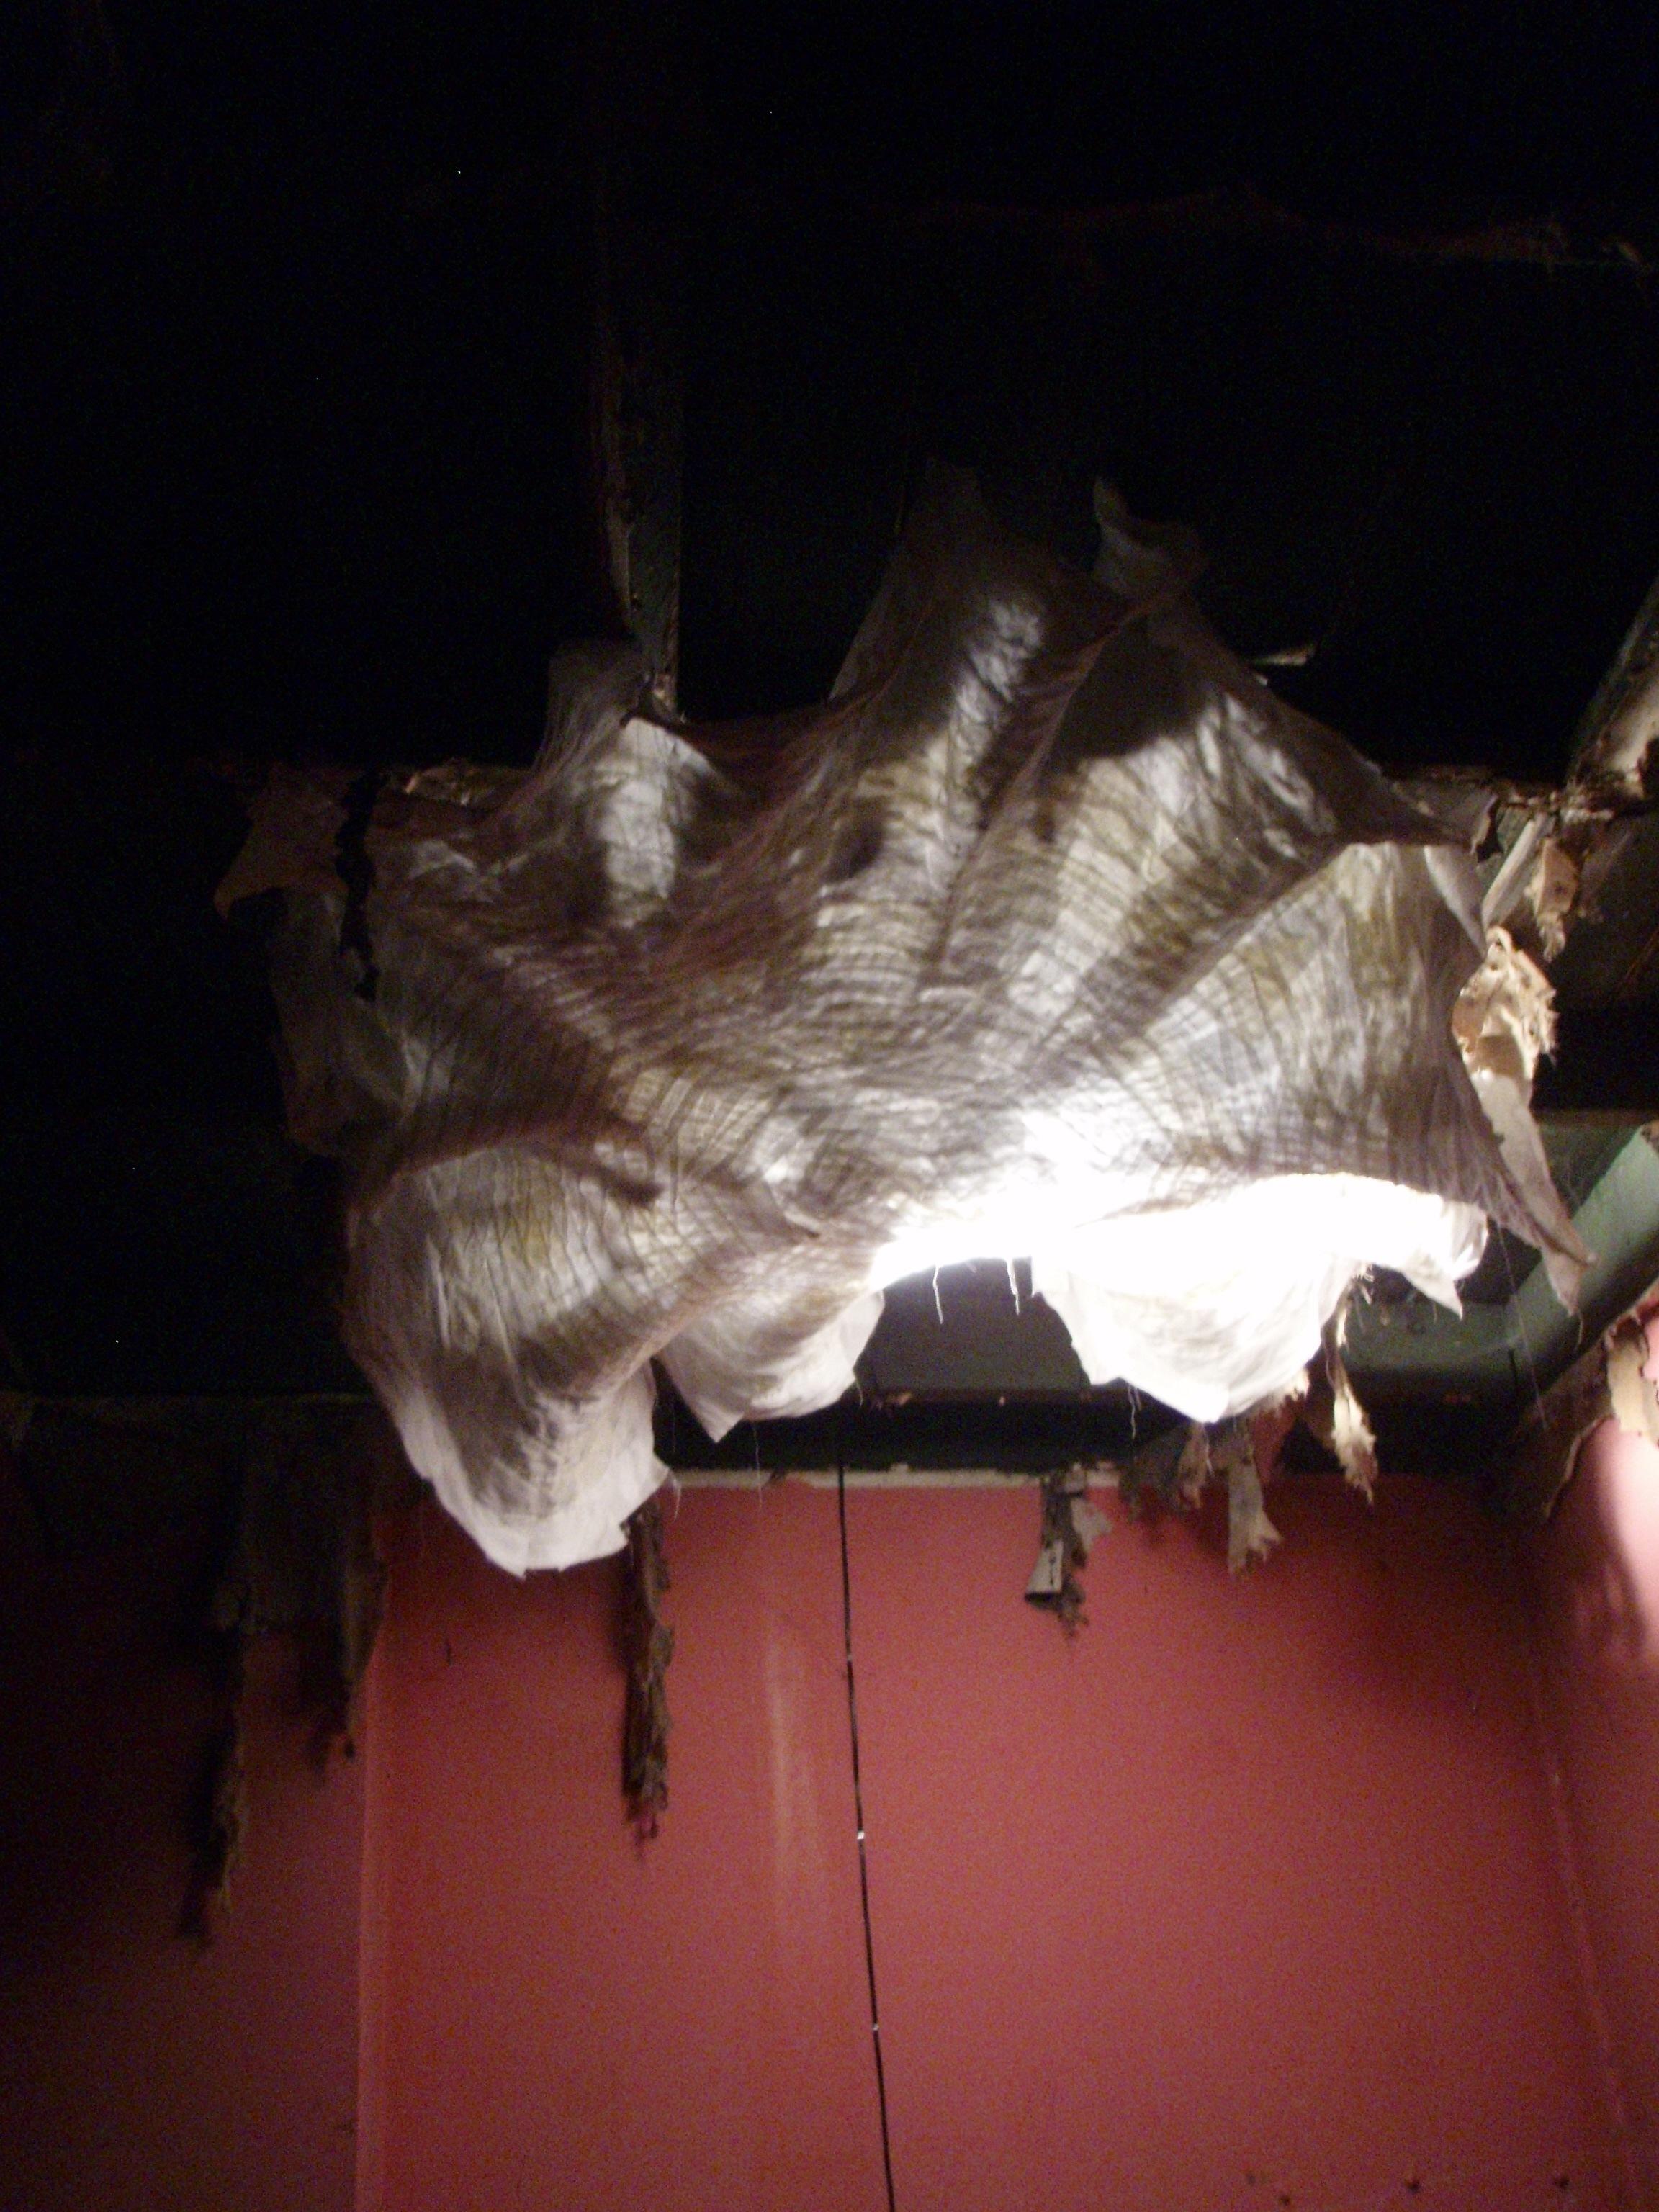 bandage ceiling piec